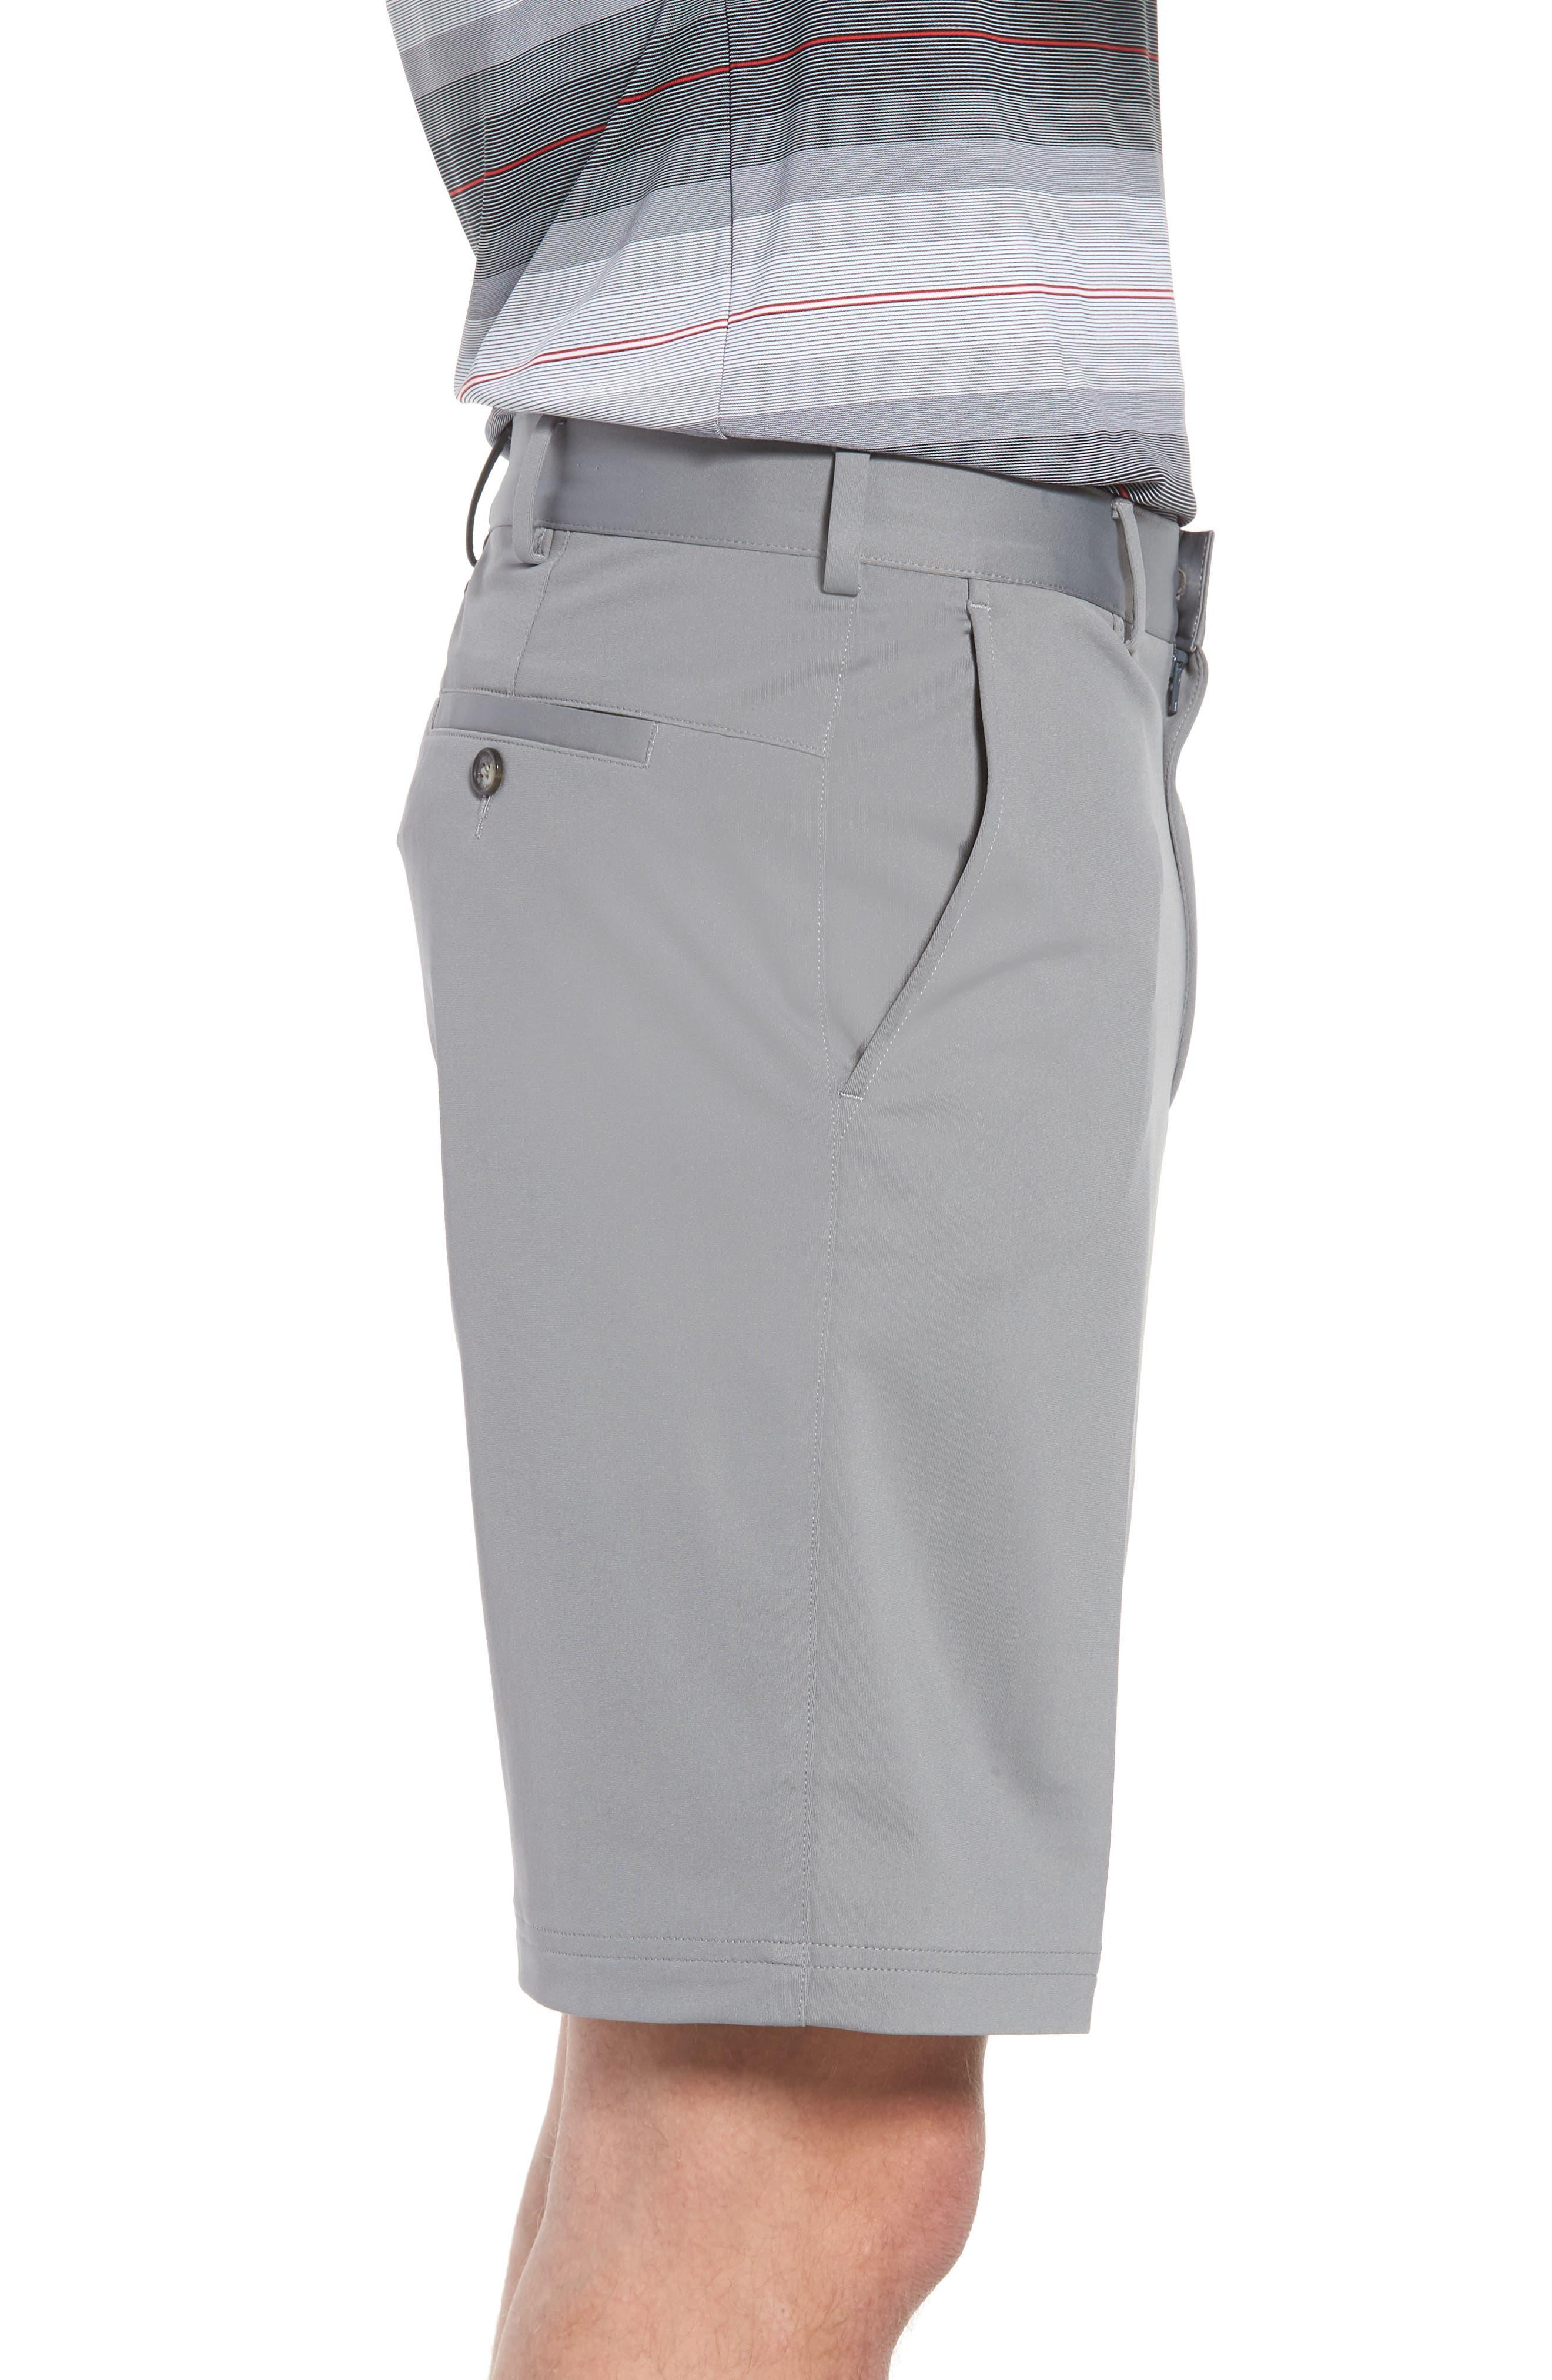 Trim Fit Tech Chino Shorts,                             Alternate thumbnail 3, color,                             Graphite Heather